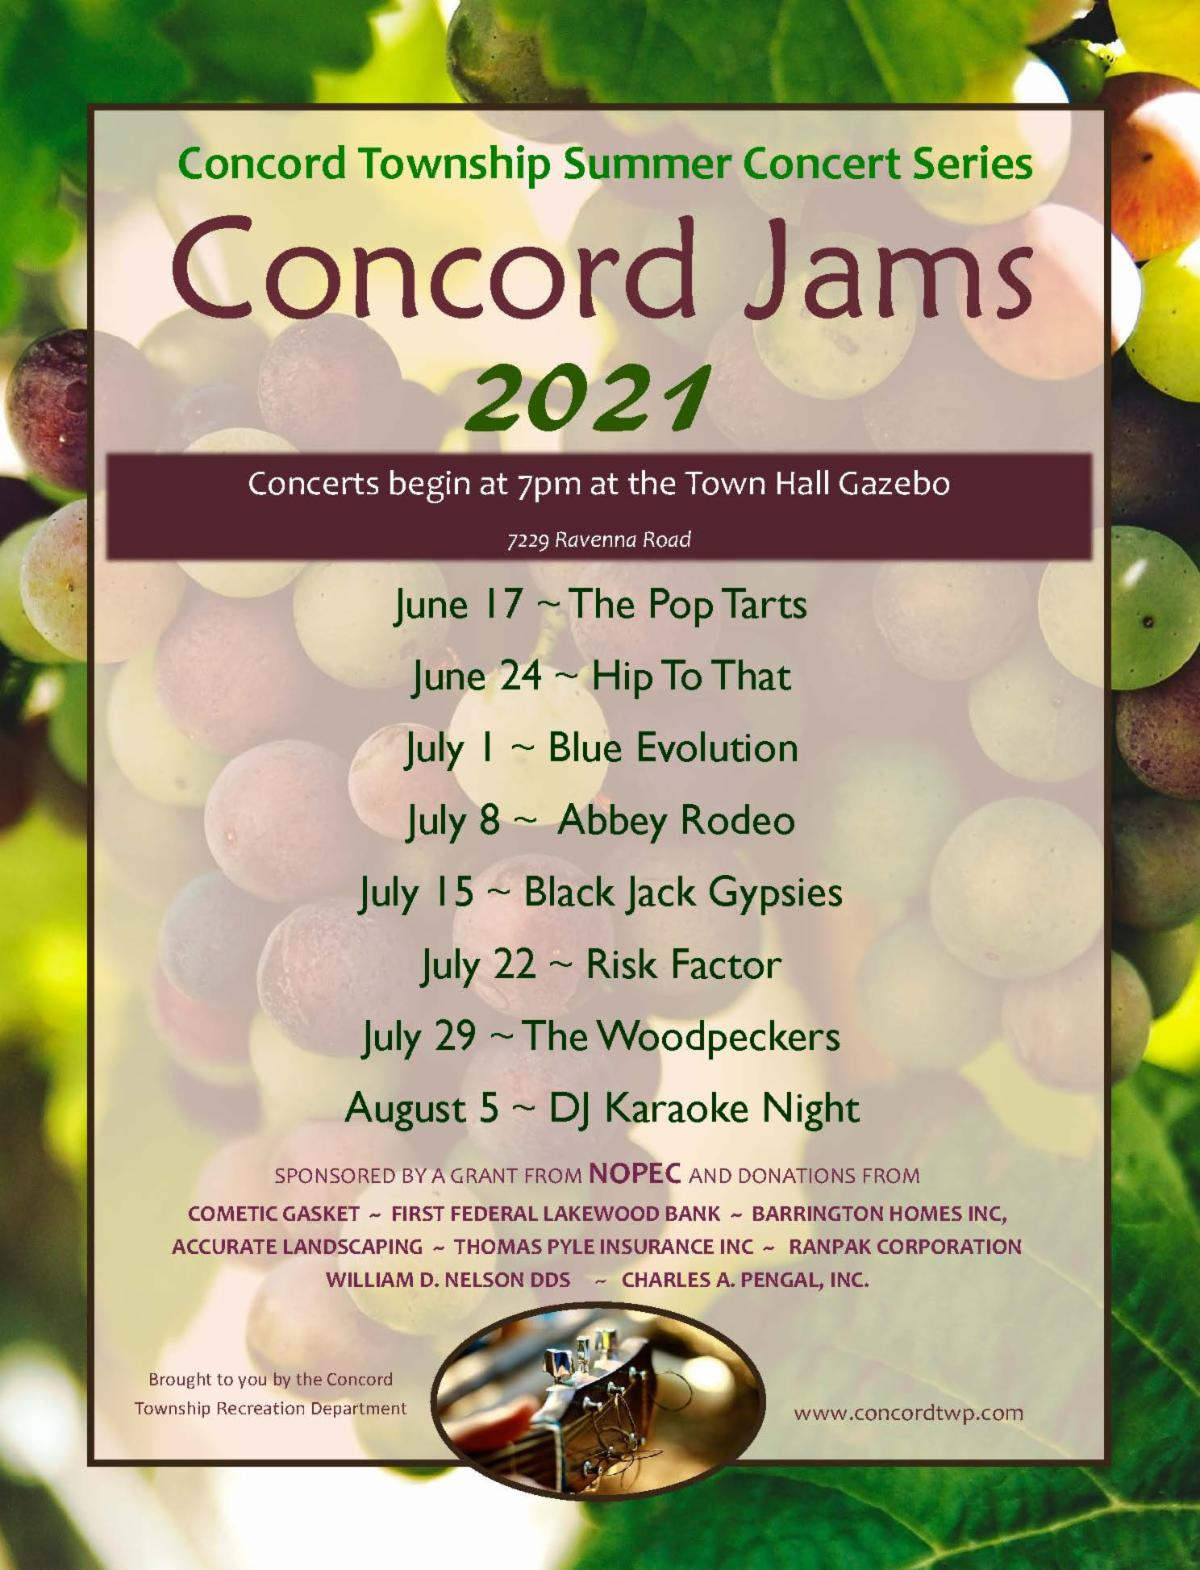 Concord Jams